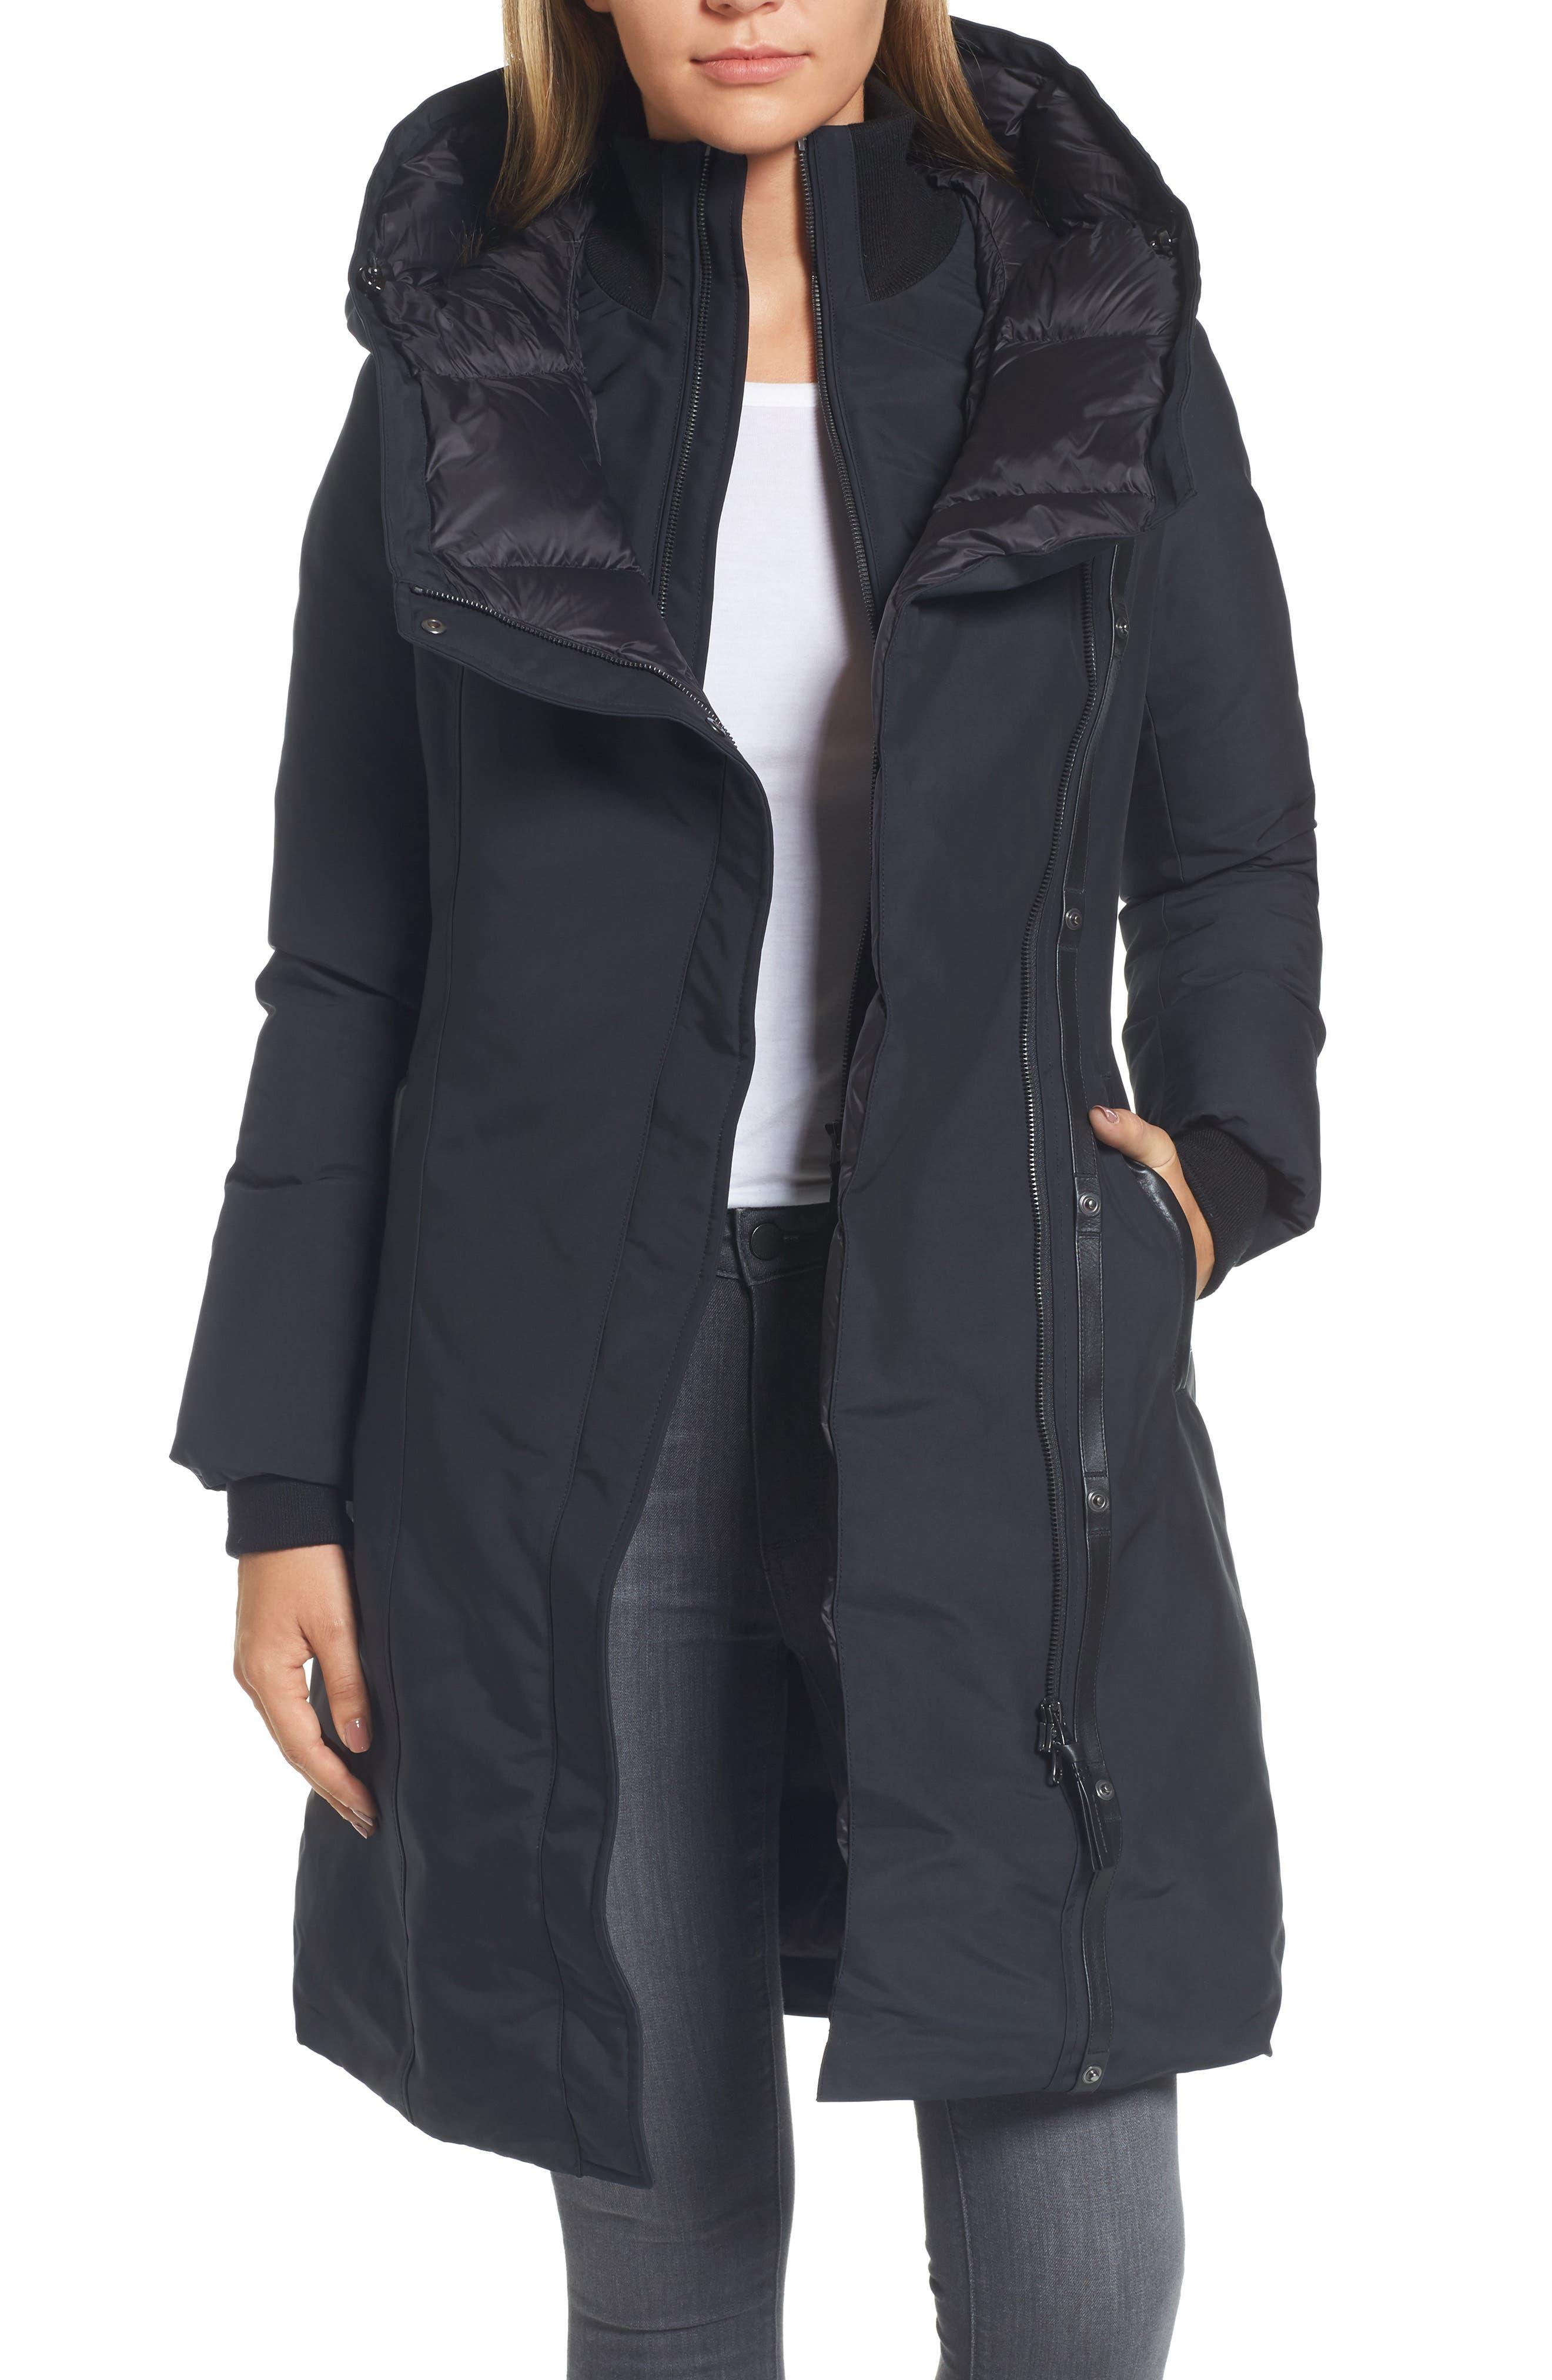 Mackage Hooded Asymmetrical Down Coat with Inset Bib